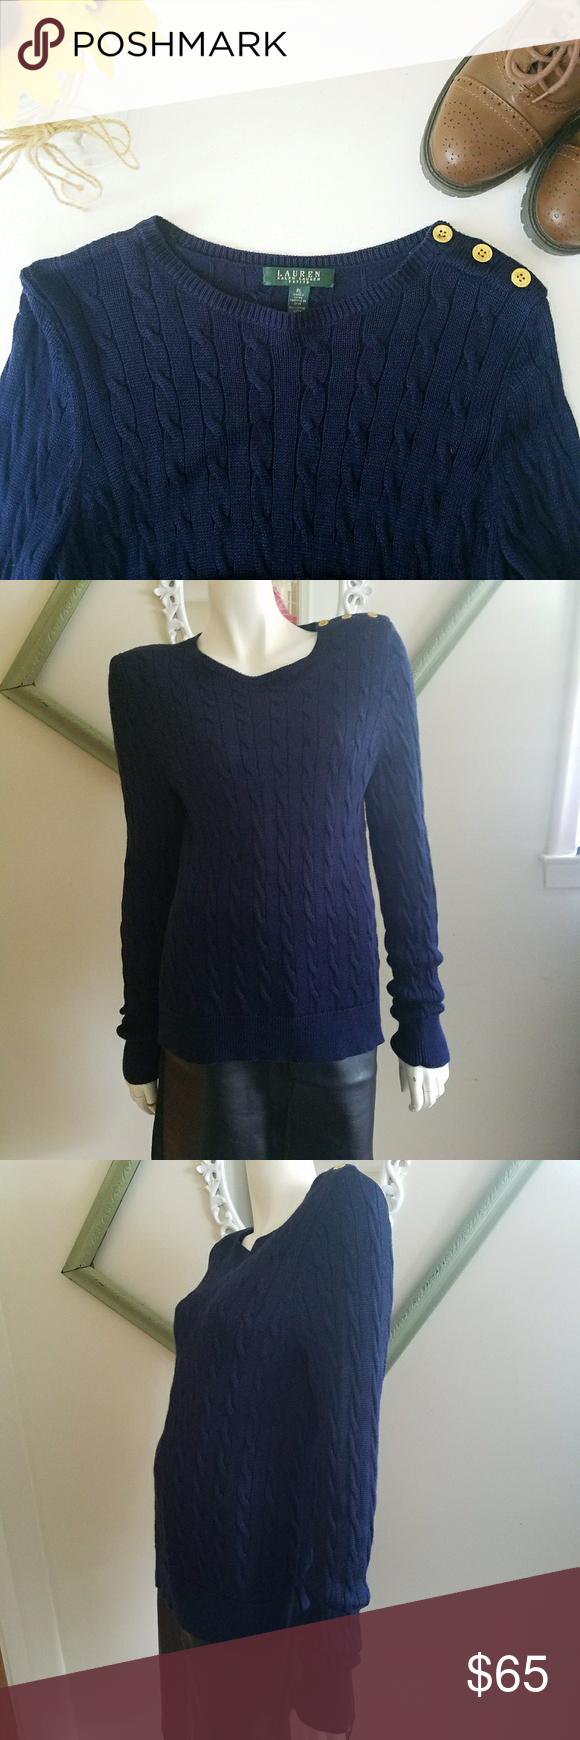 Lauren By Ralph Lauren Knit Sweater | Shoulder sleeve, Cable ...